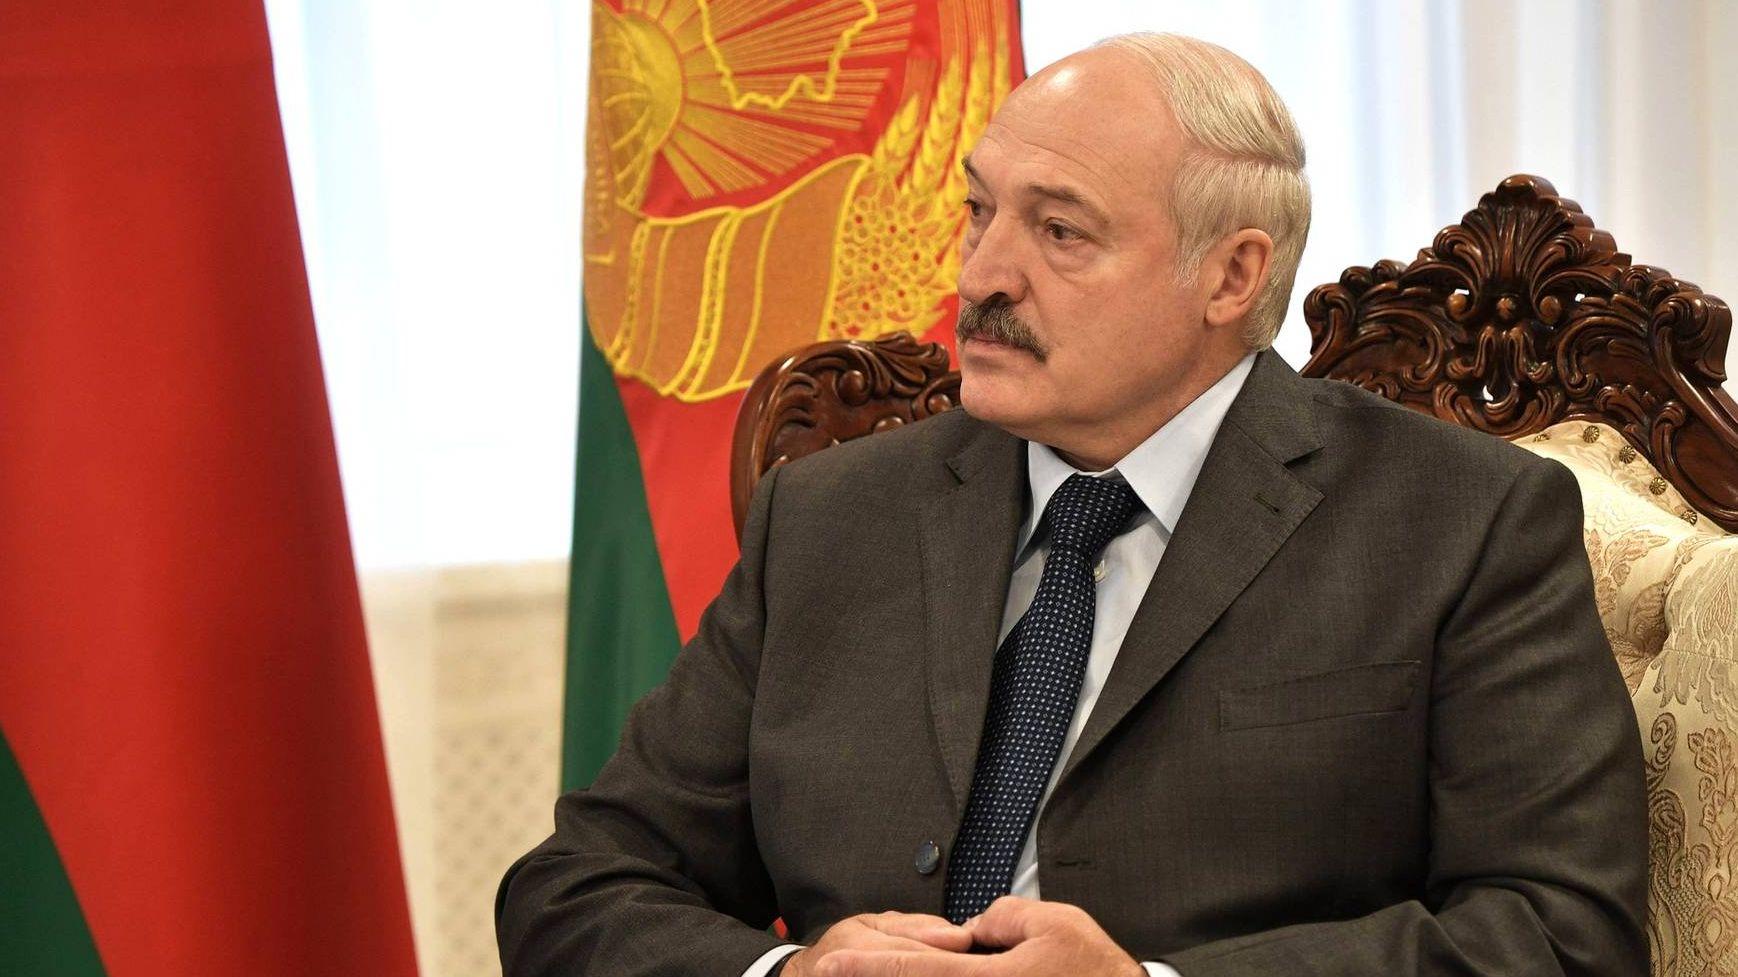 Лукашенко Александр Лукашенко